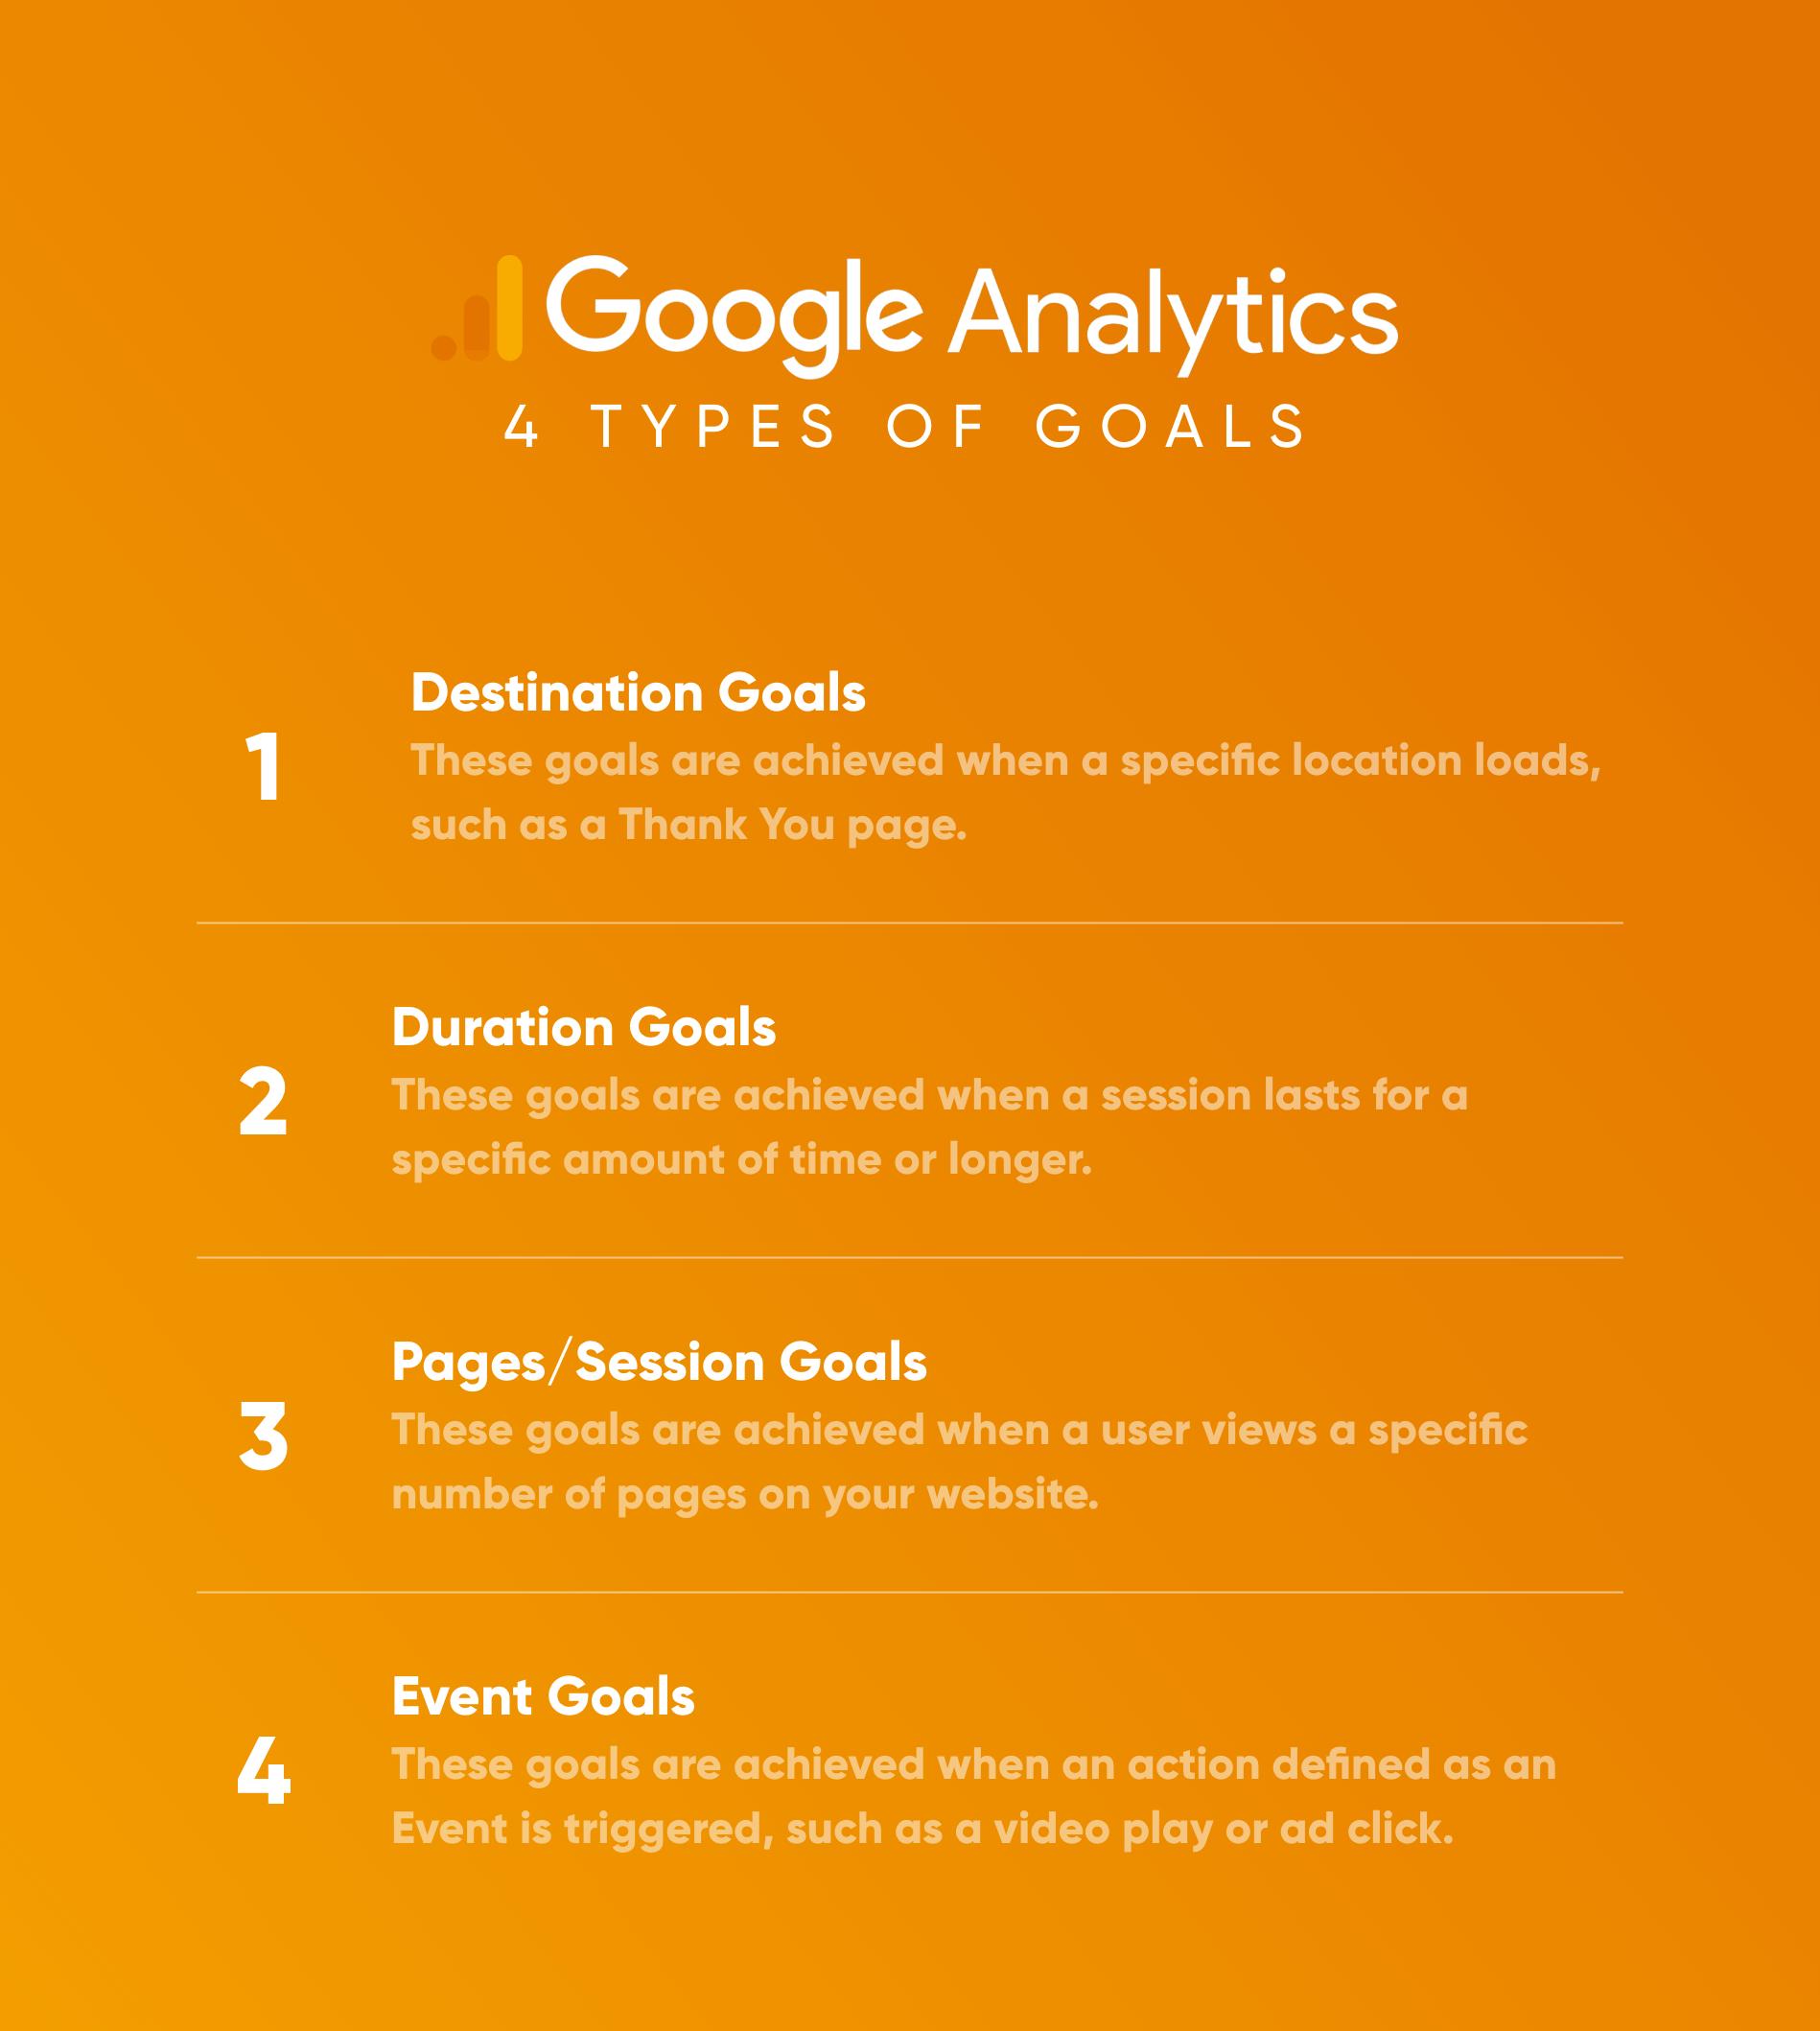 Google Analytics - 4 Types of Goals